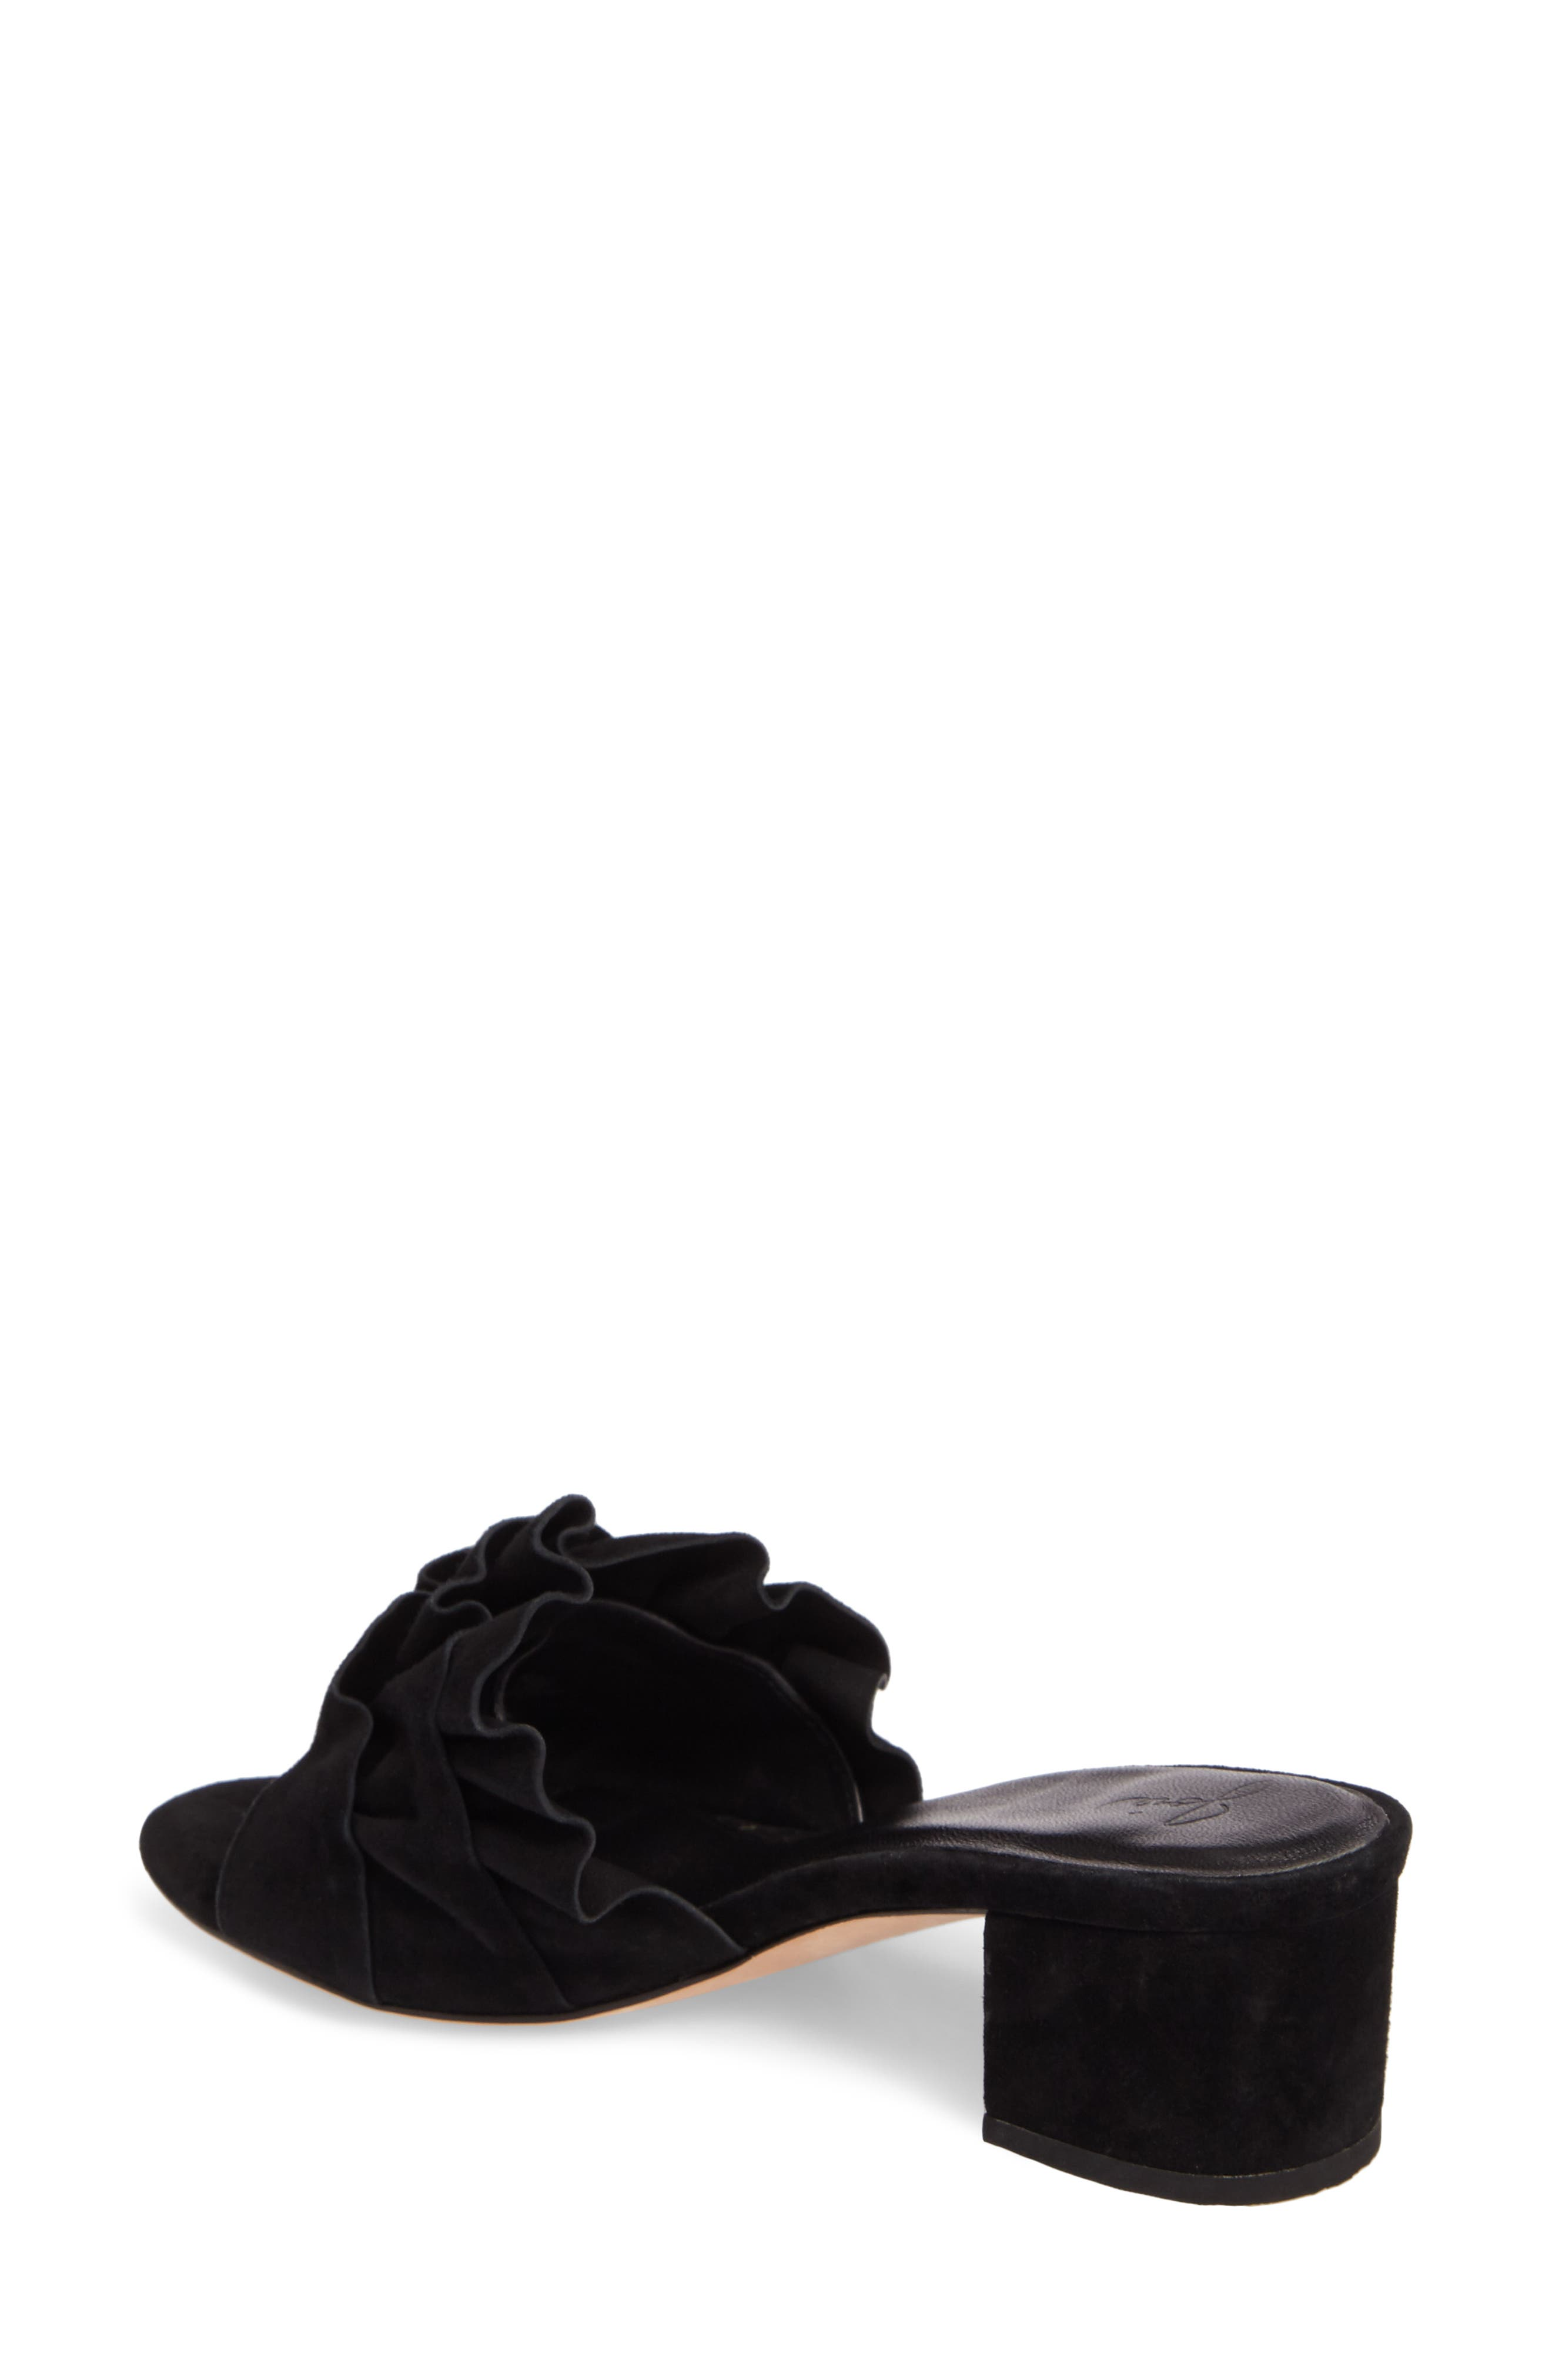 Mai Ruffle Slide Sandal,                             Alternate thumbnail 2, color,                             Black